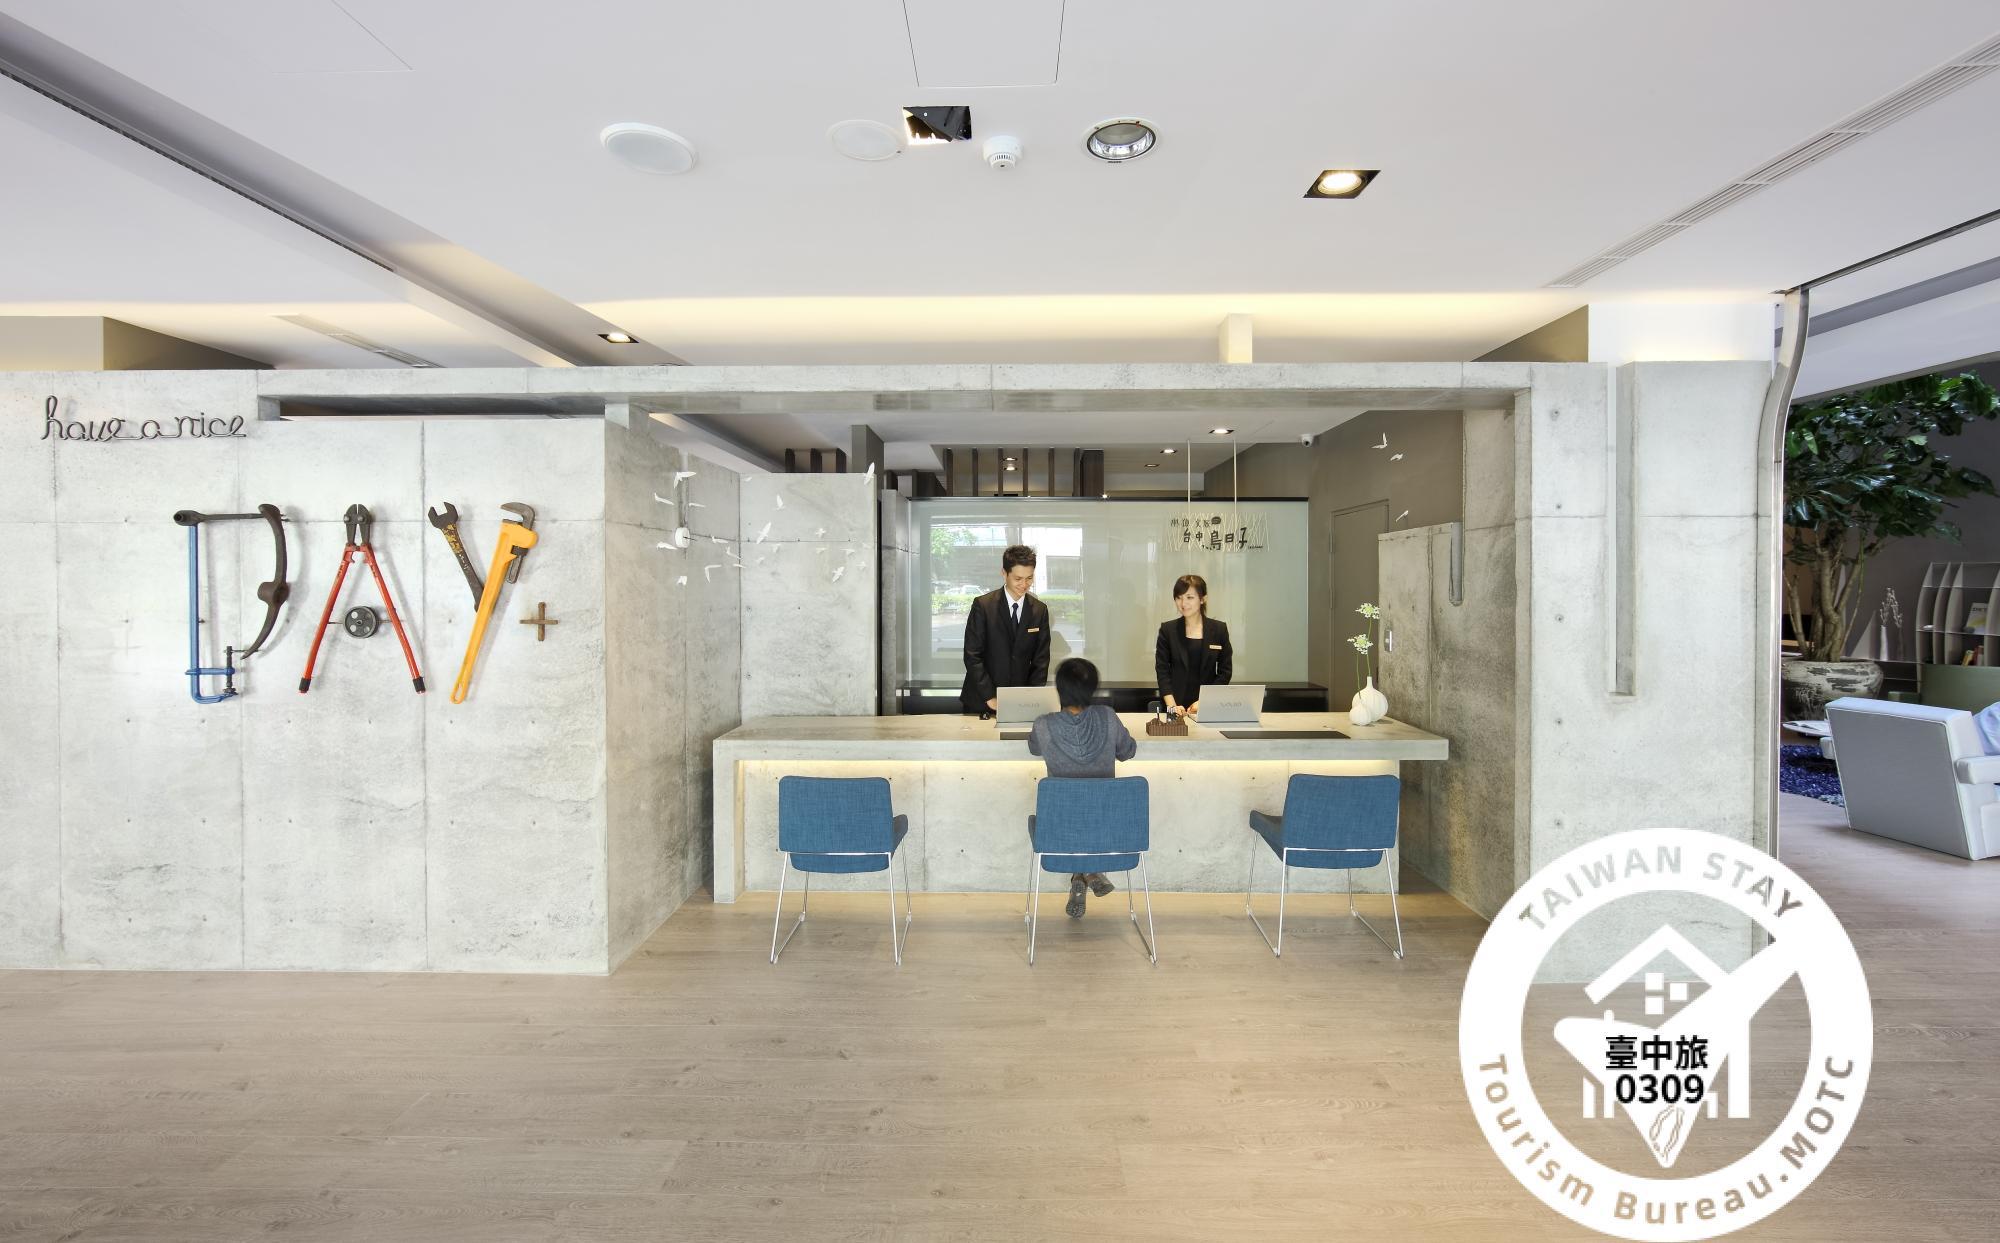 Chanyee Hotelday Designer Hotels